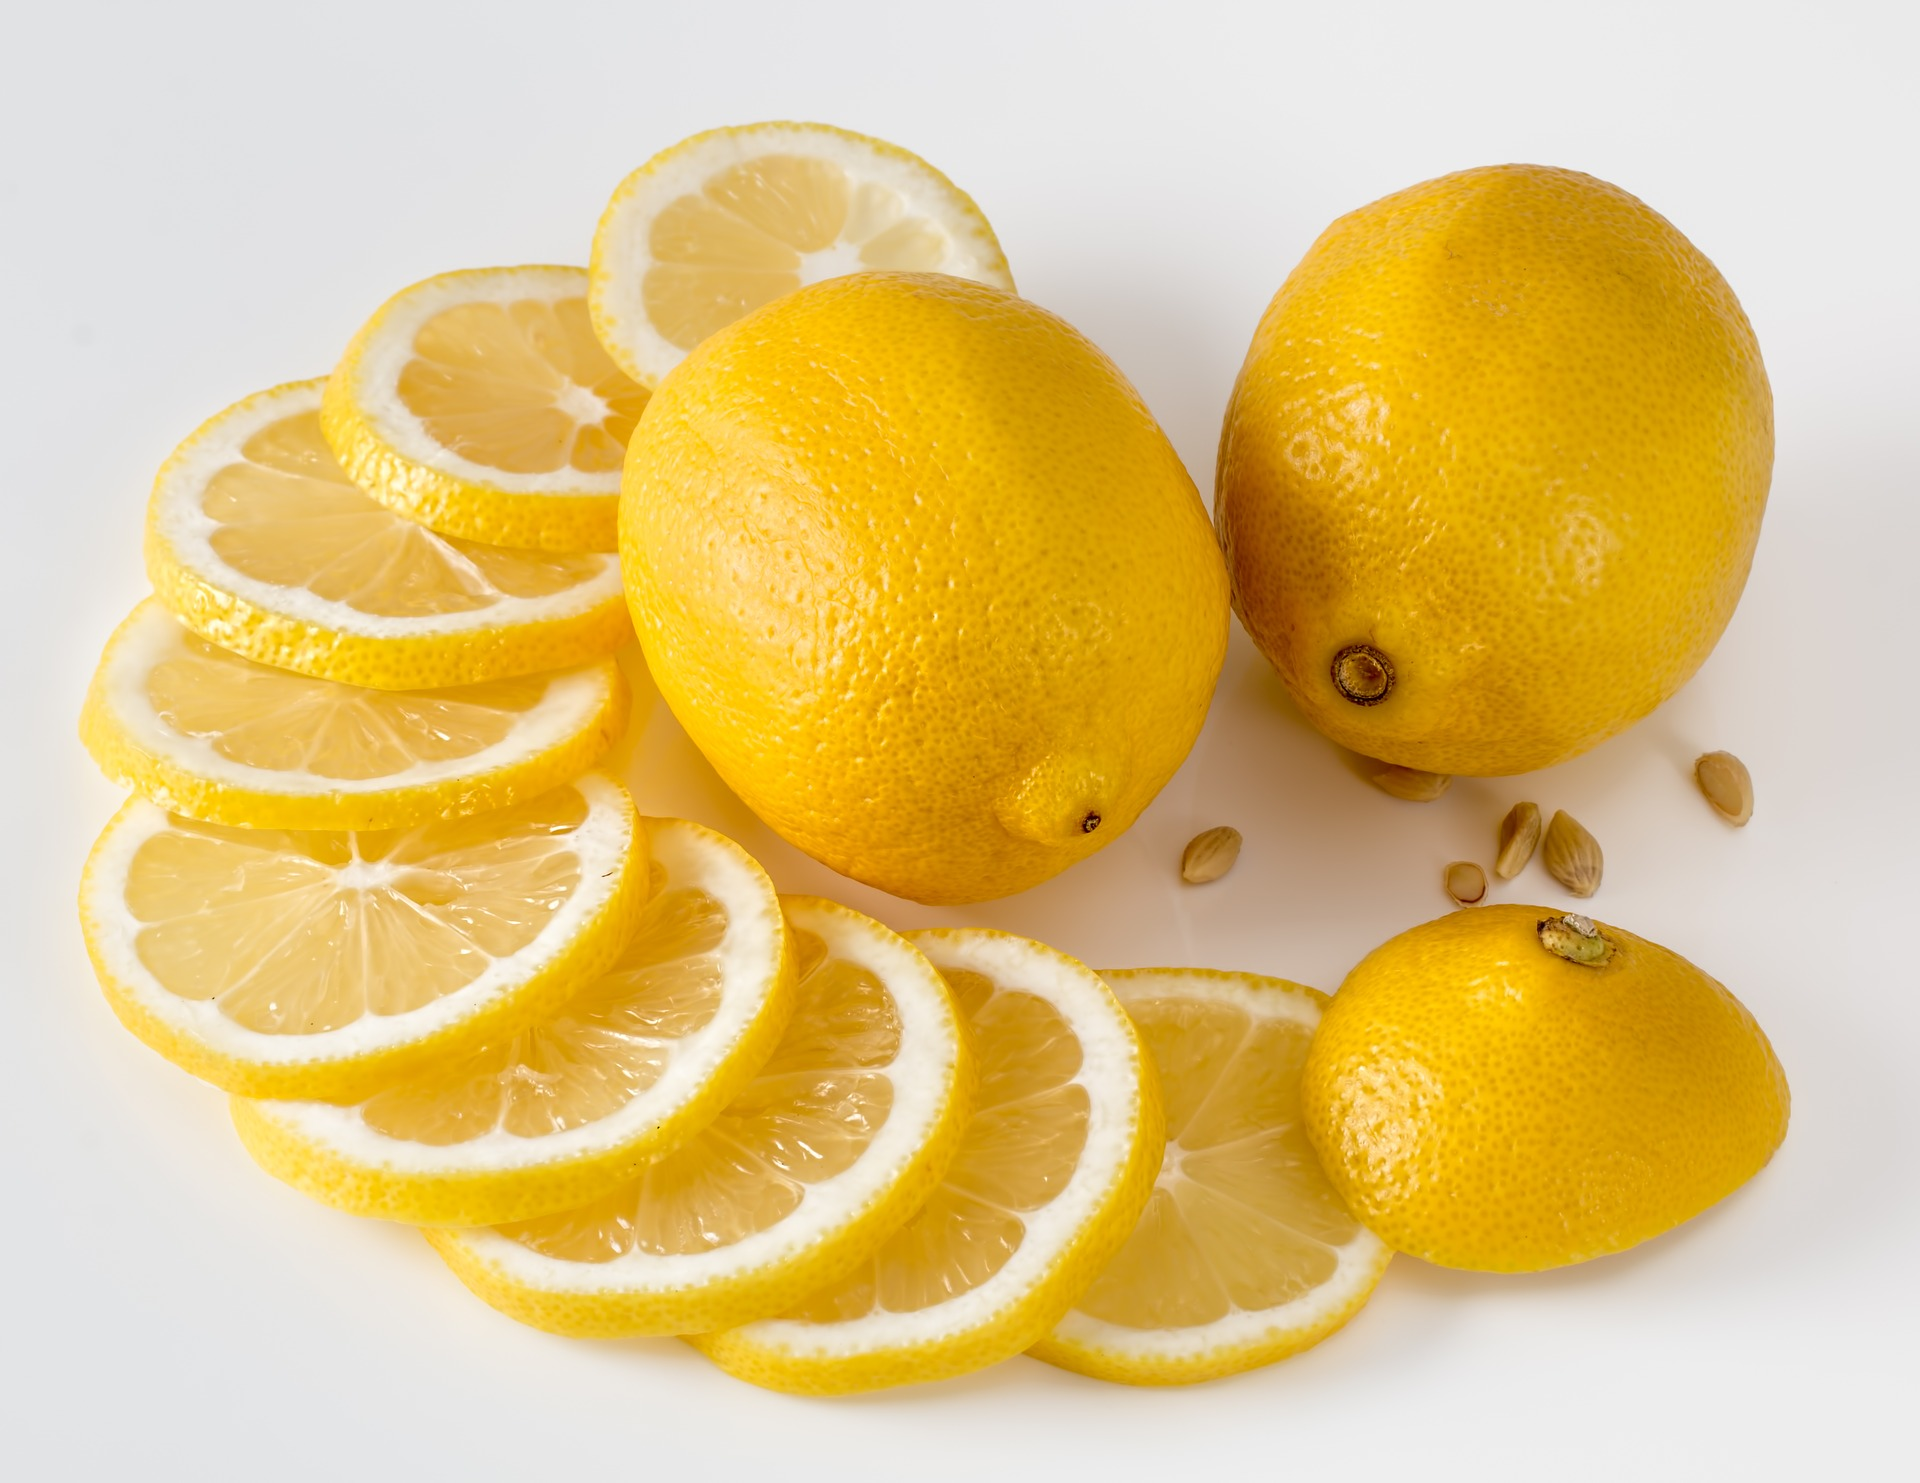 citron%20v%C5%AFn%C4%9B%20do%20vodn%C3%ADho%20vysava%C4%8De